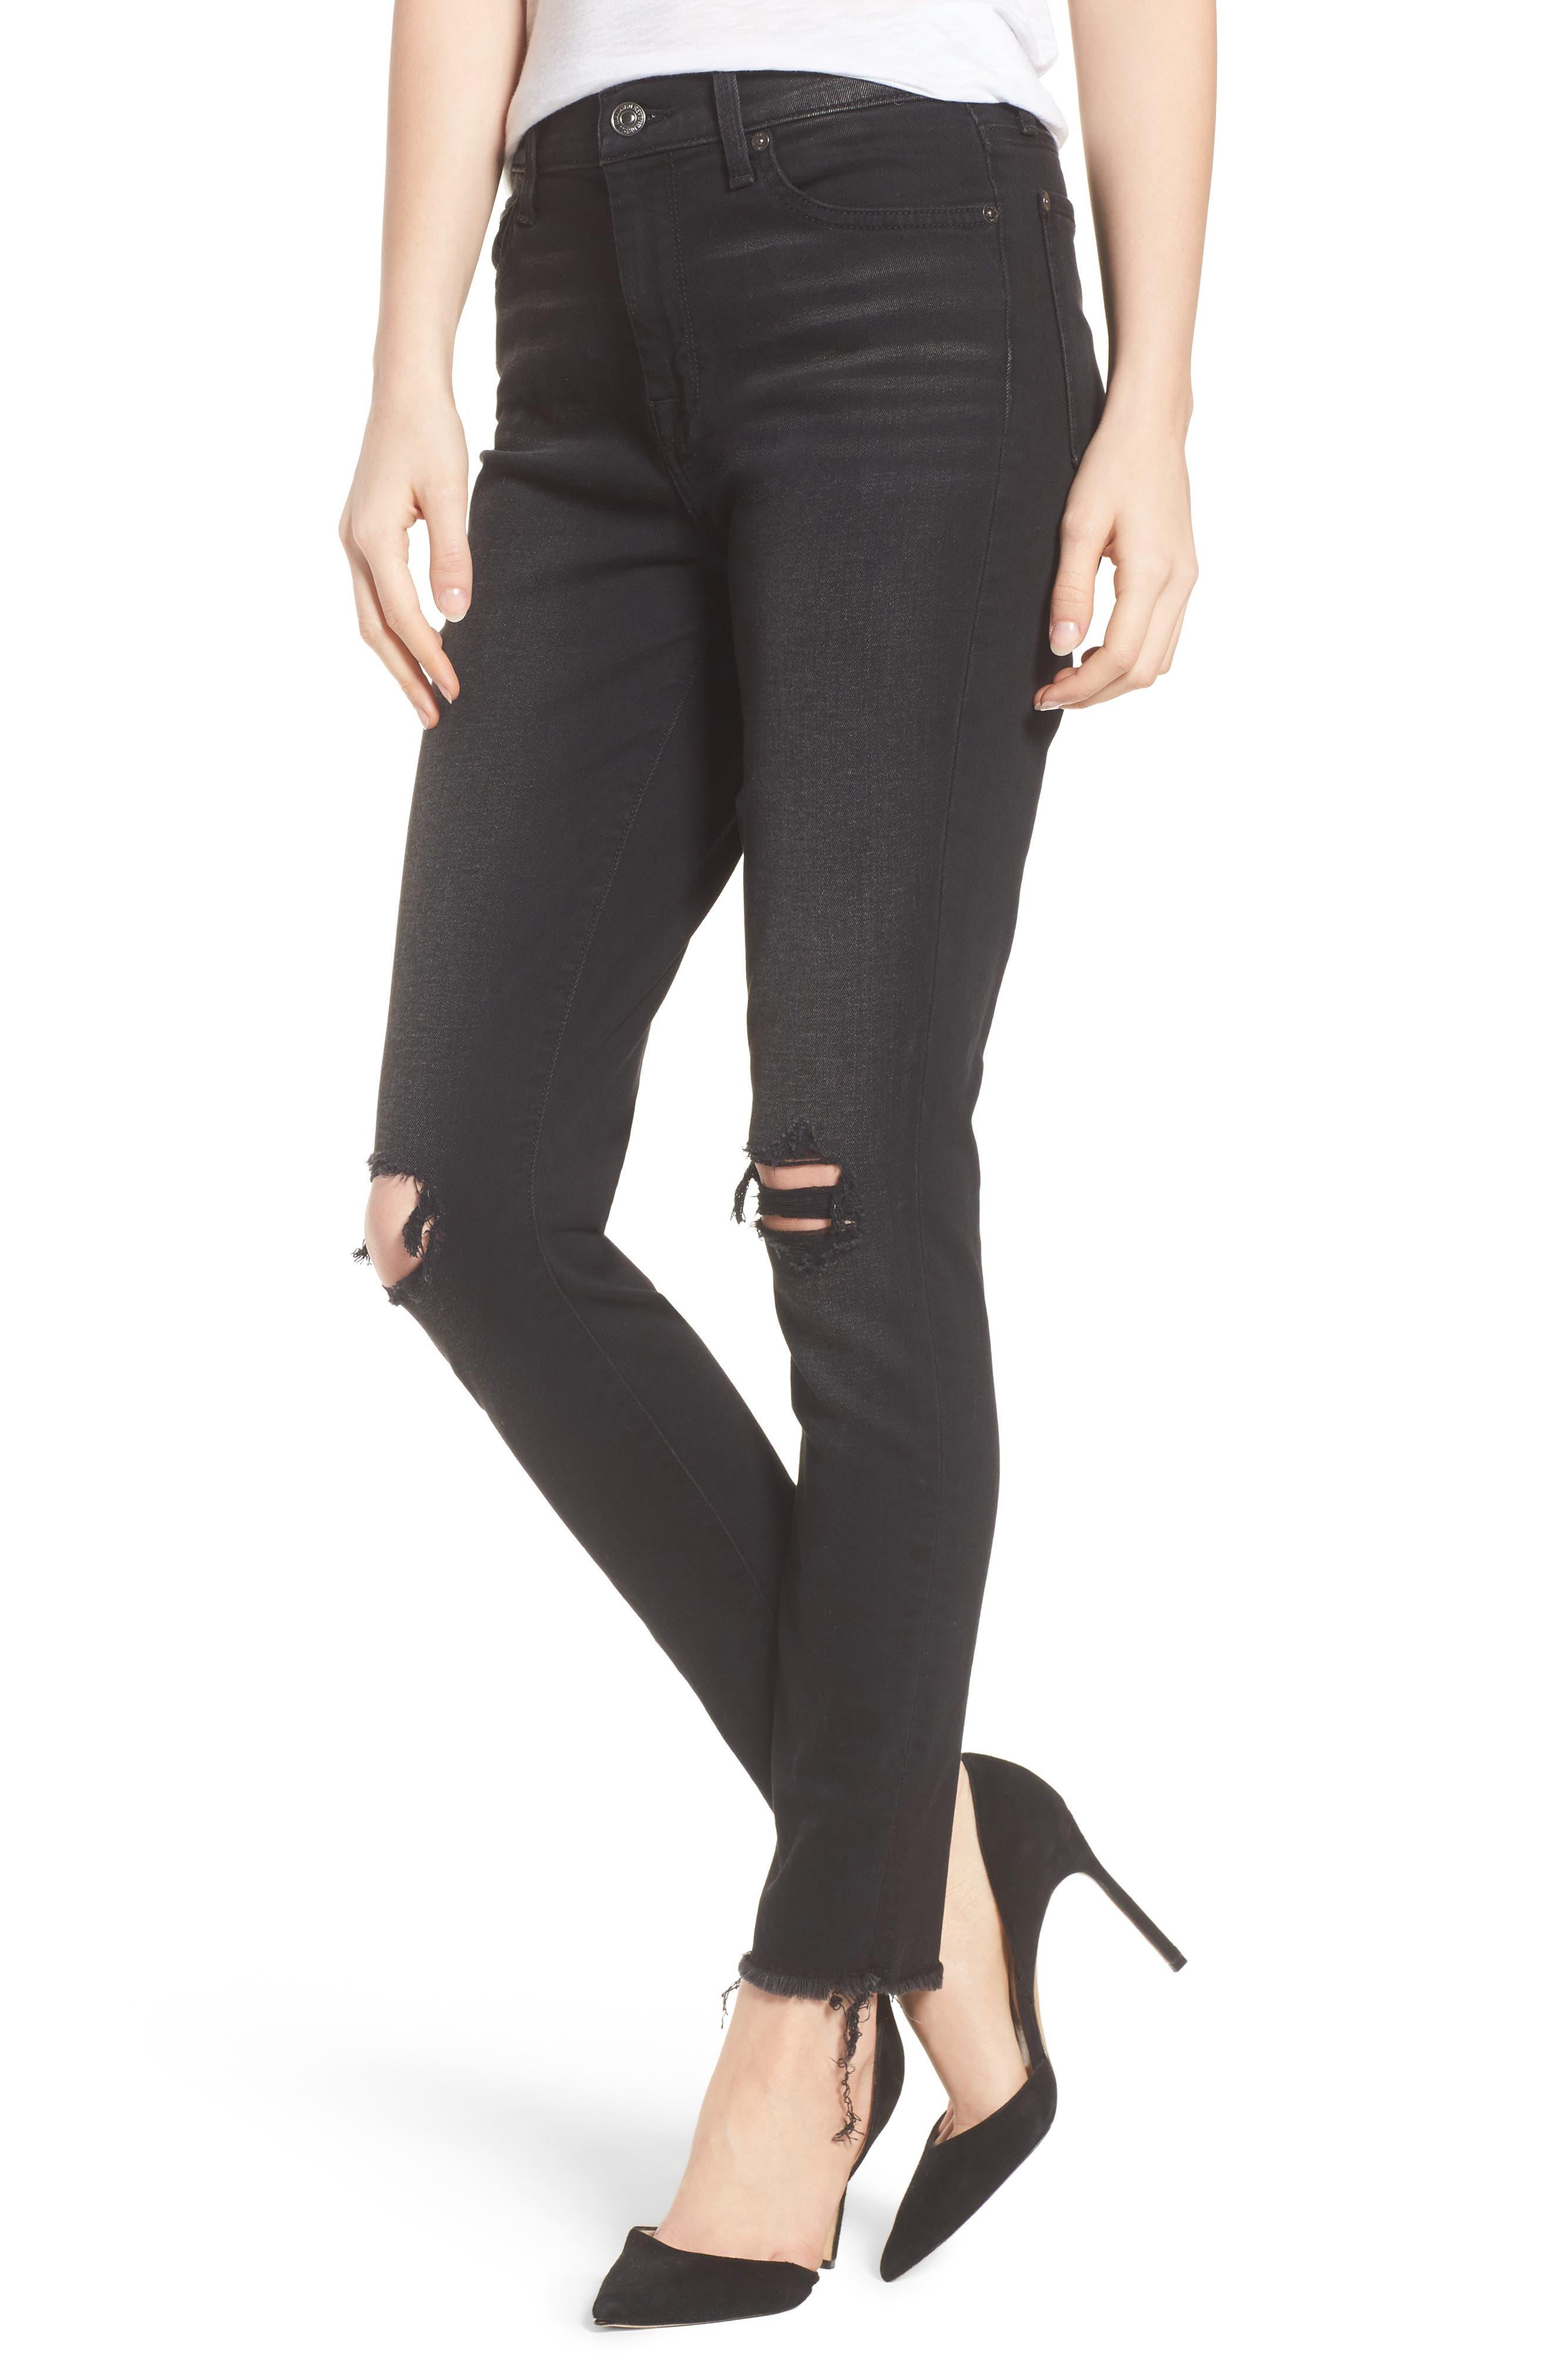 Main Image - 7 For All Mankind® Aubrey High Waist Skinny Jeans (Aged Onyx 3)